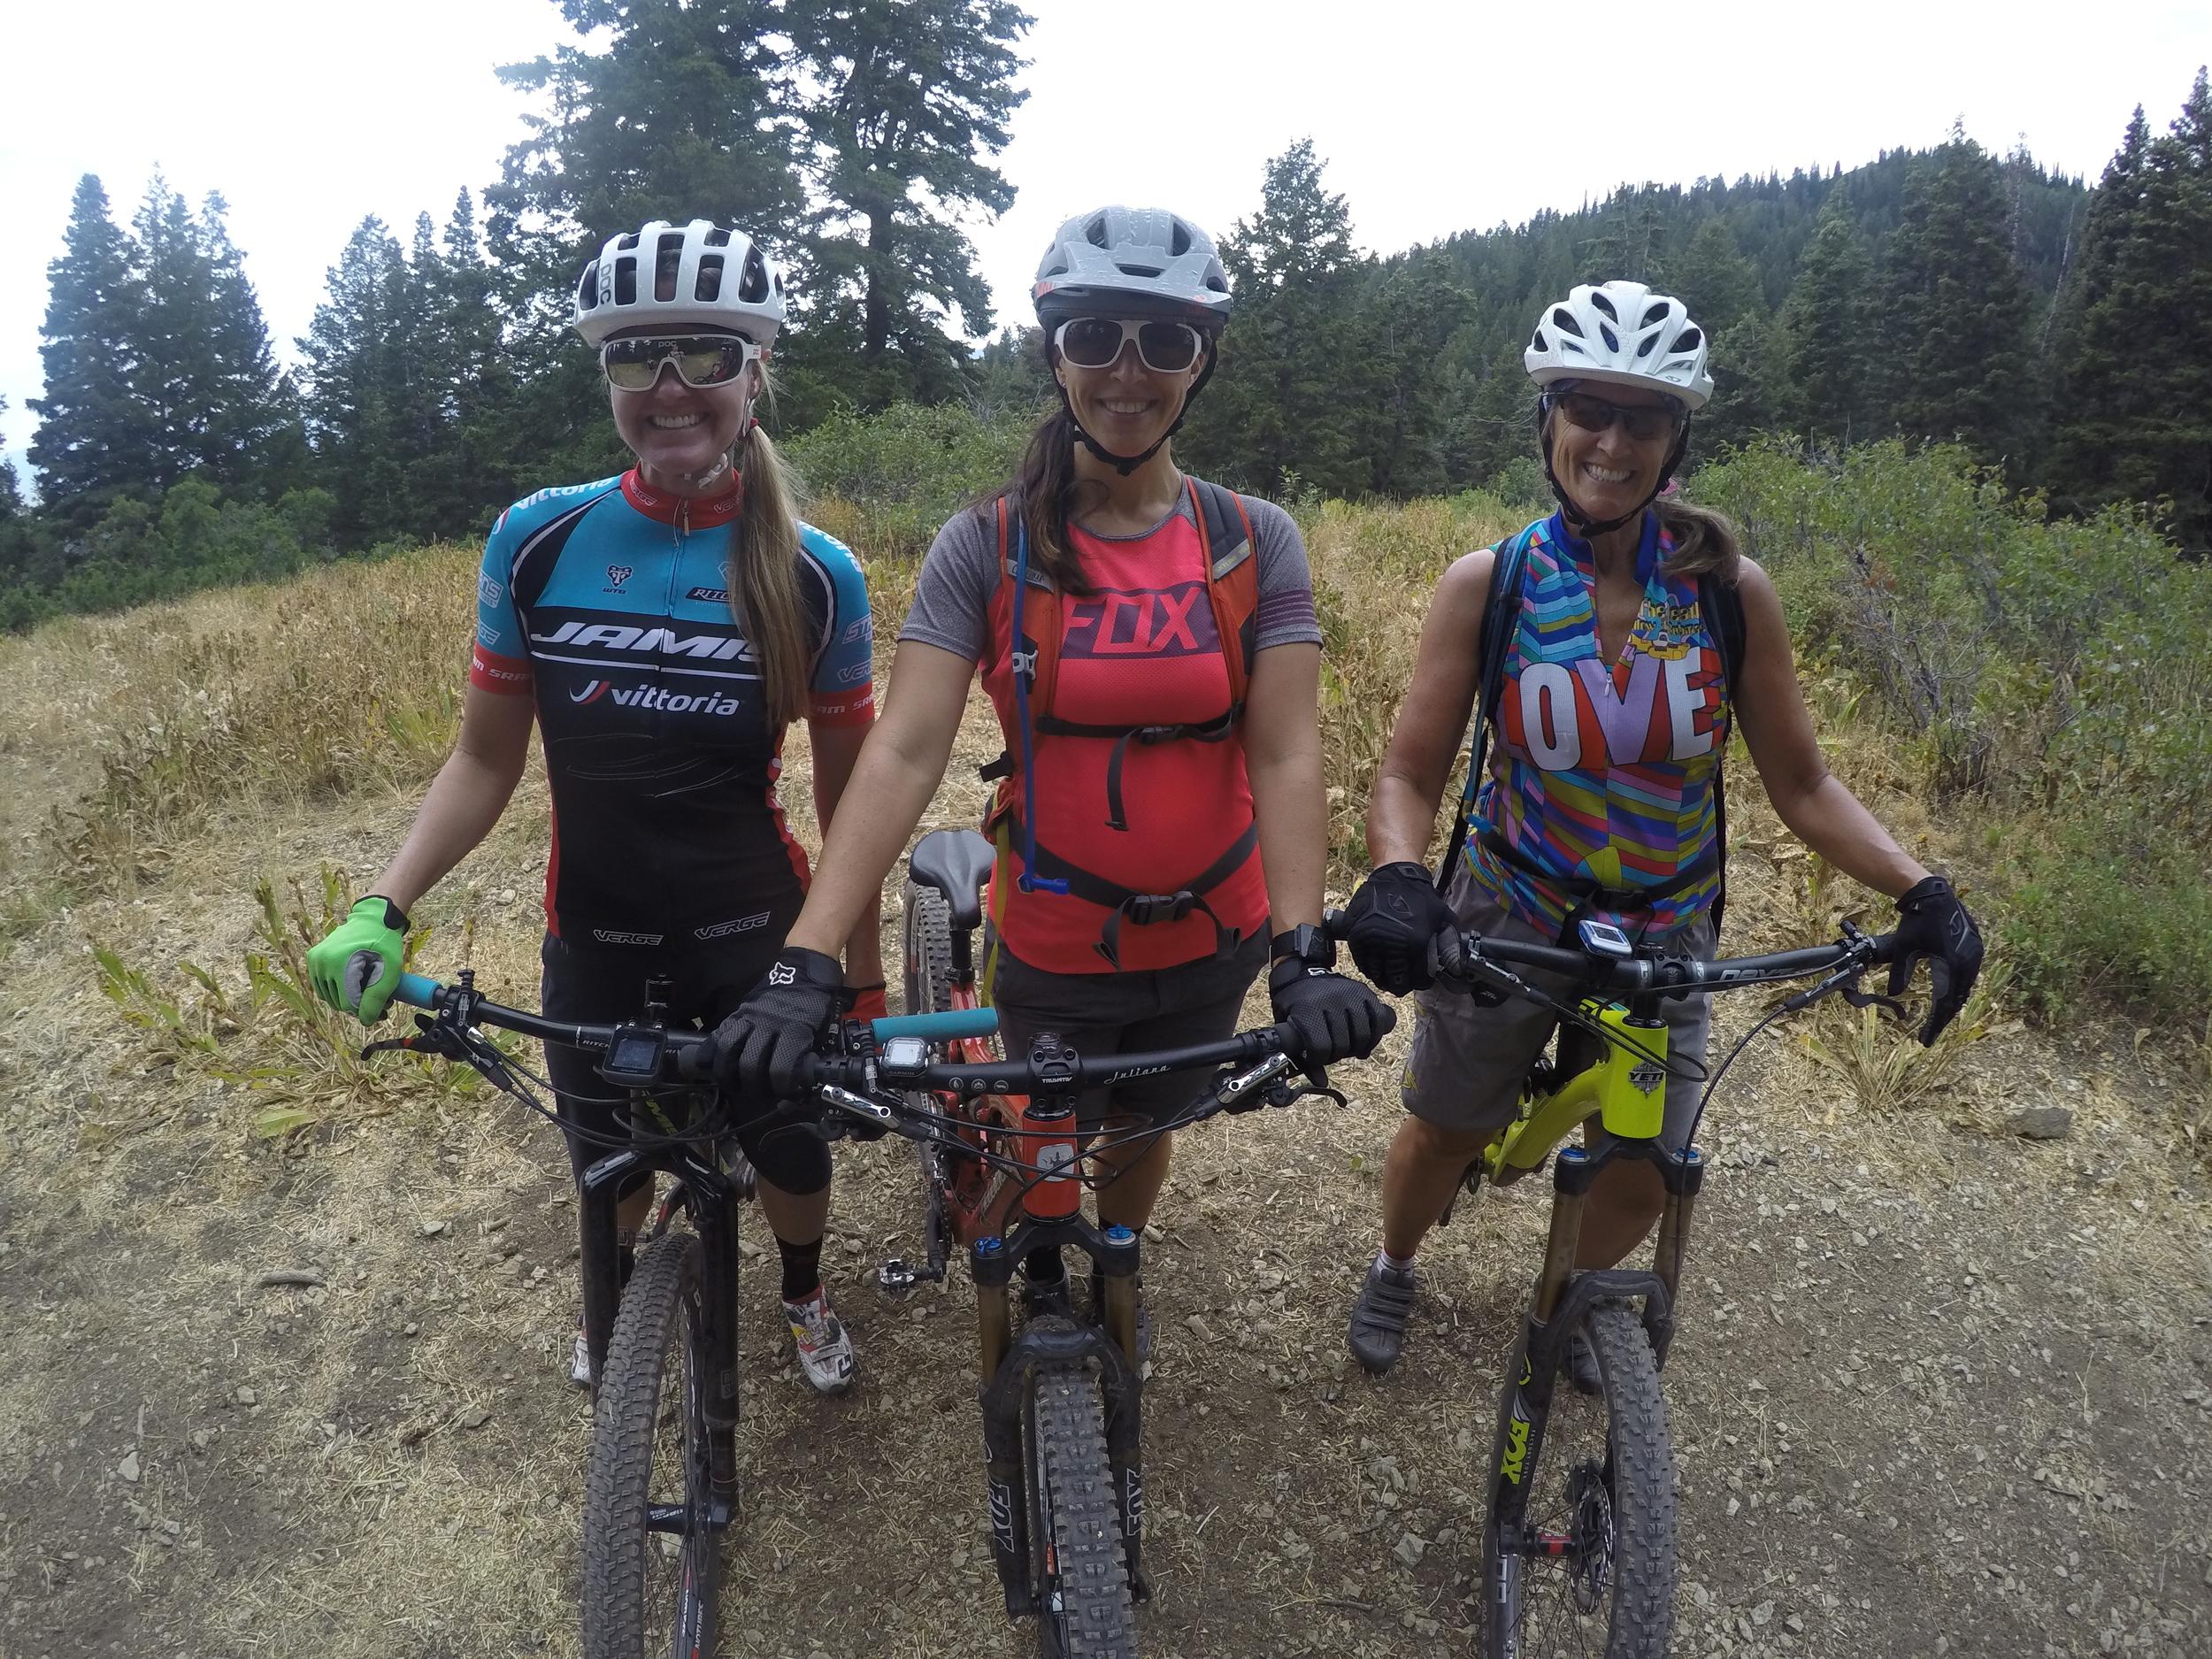 Erica, Nora, Lynne